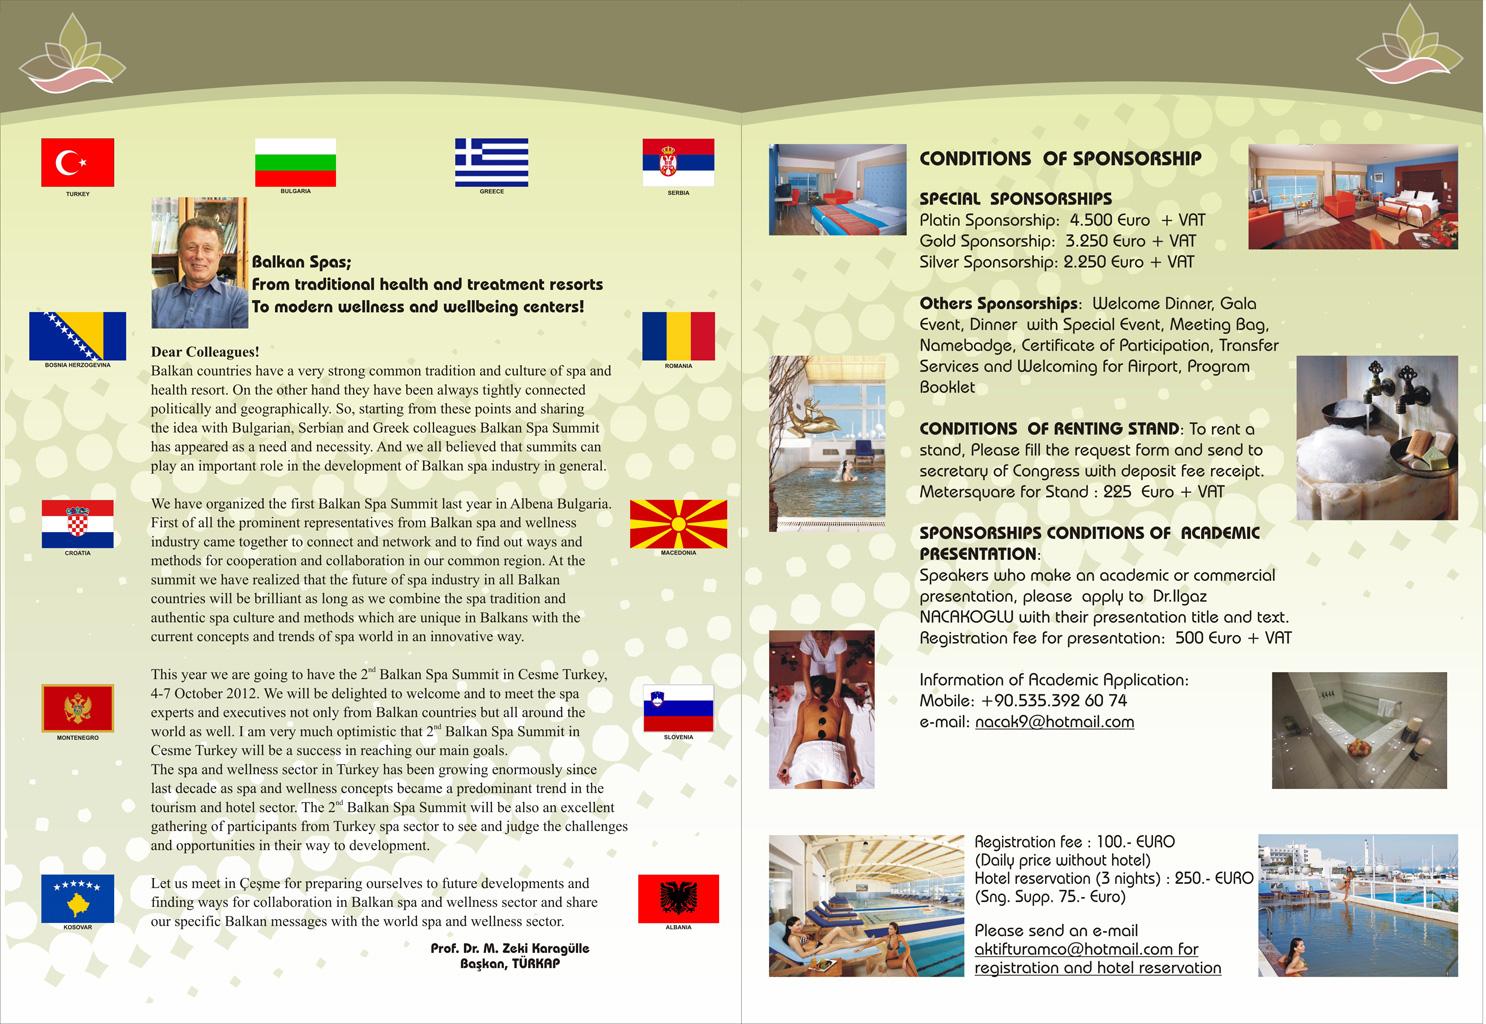 2 Balkan Spa Summit Thermal Spa Health